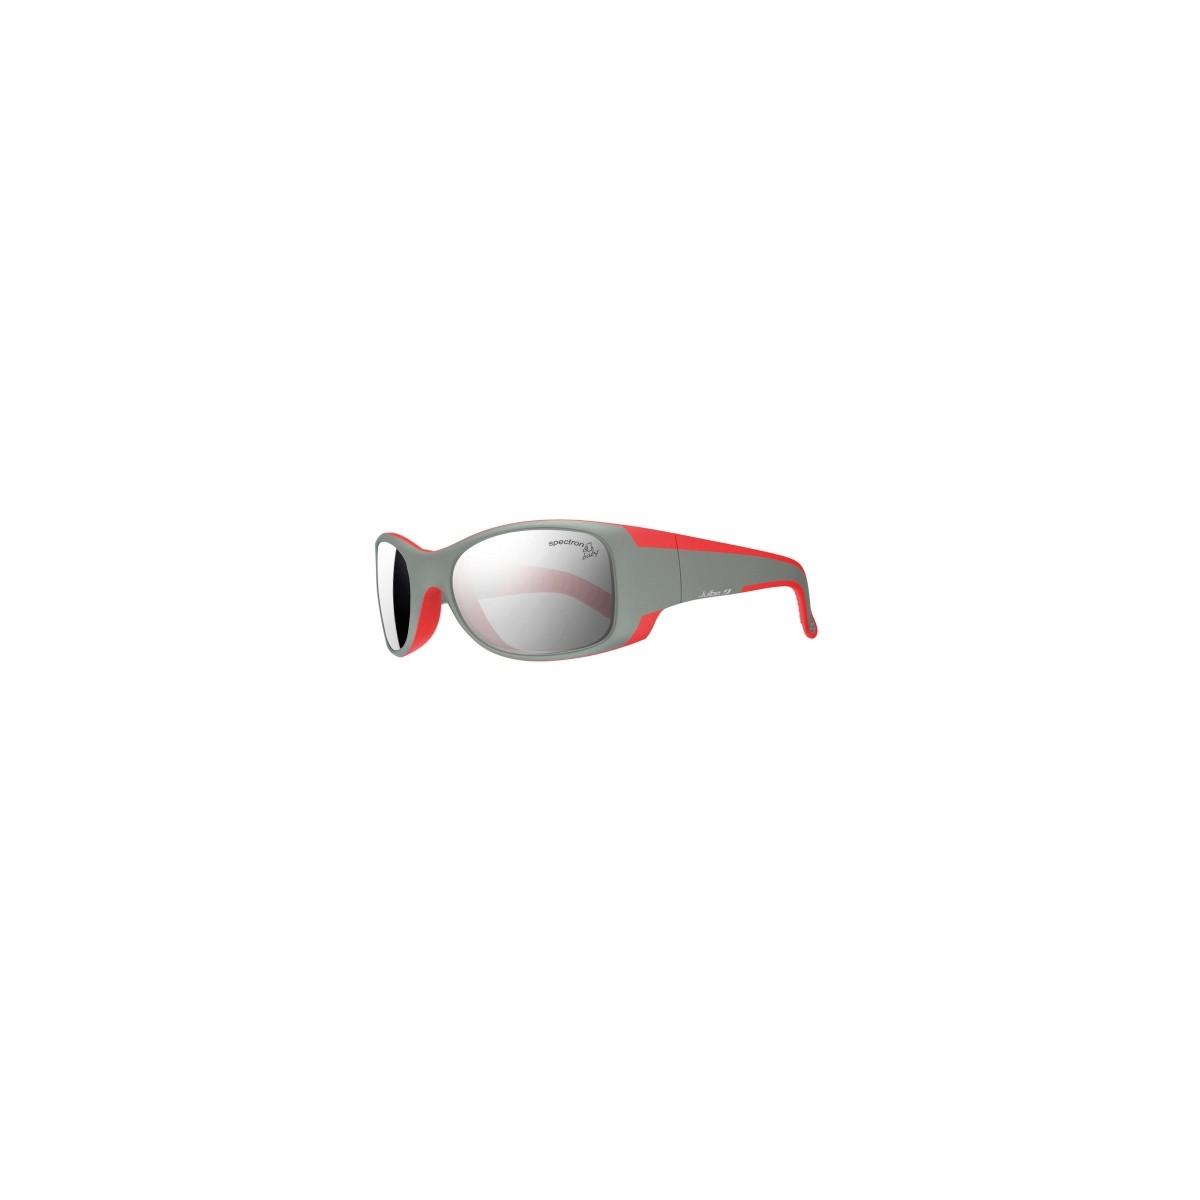 julbo lunettes de soleil junior booba lunettes de soleil junior booba lunettes de soleil. Black Bedroom Furniture Sets. Home Design Ideas